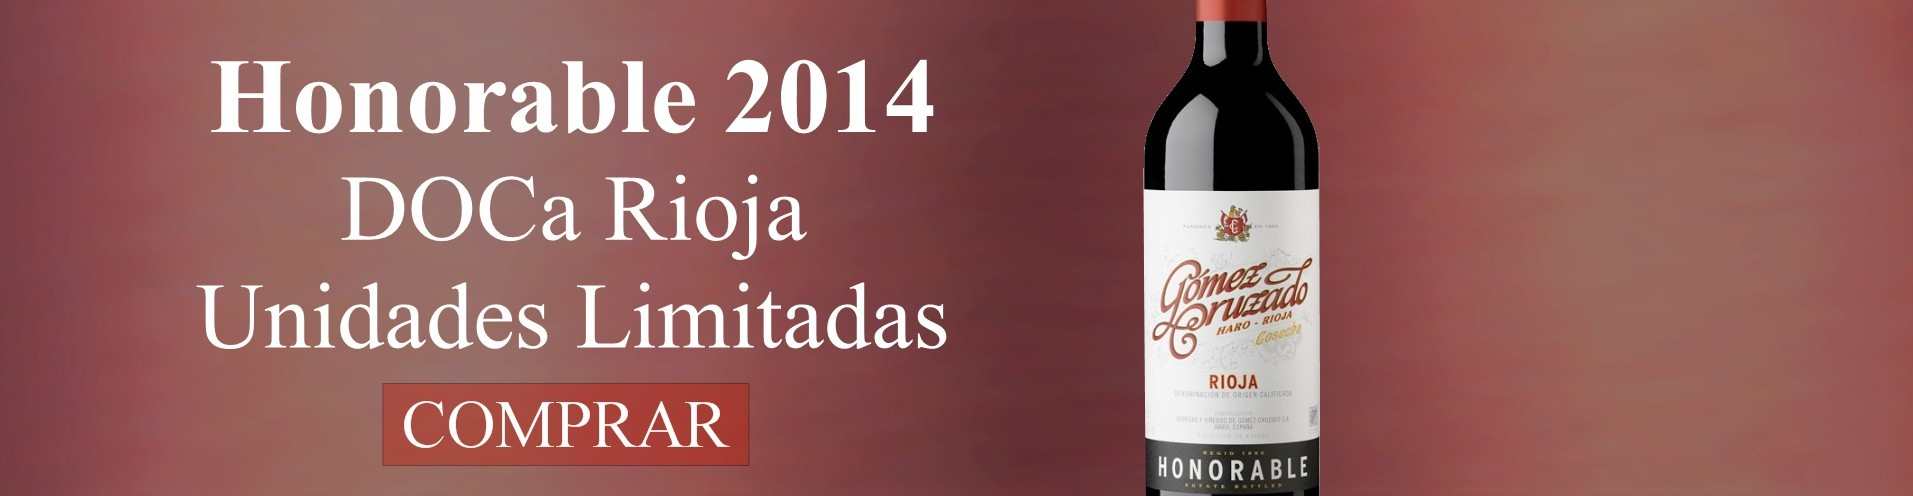 Honorable 2014 - Buy Wine DO Rioja